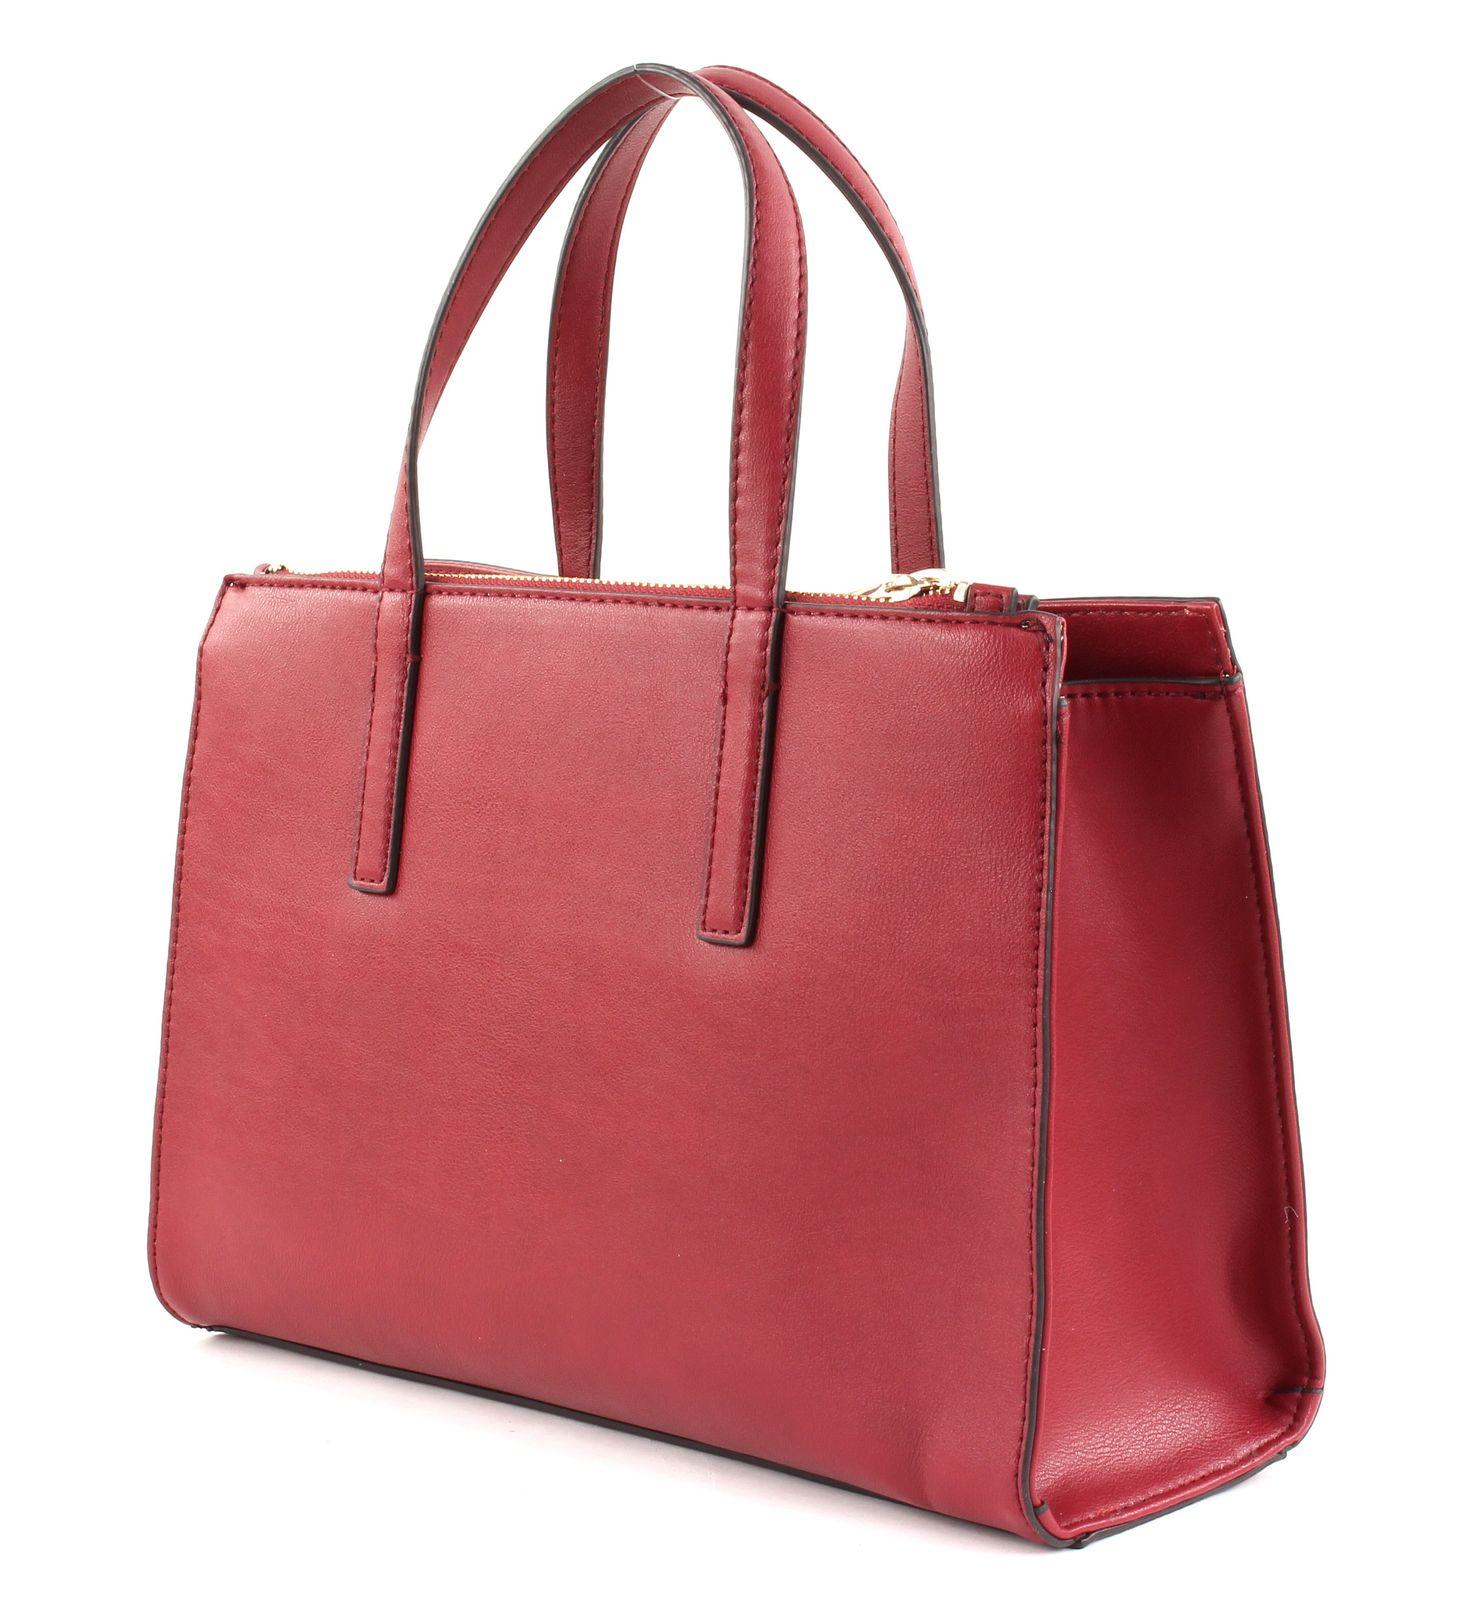 GUESS Handbag Sienna 2 in 1 Society Satchel Red 4c90b1ff0d